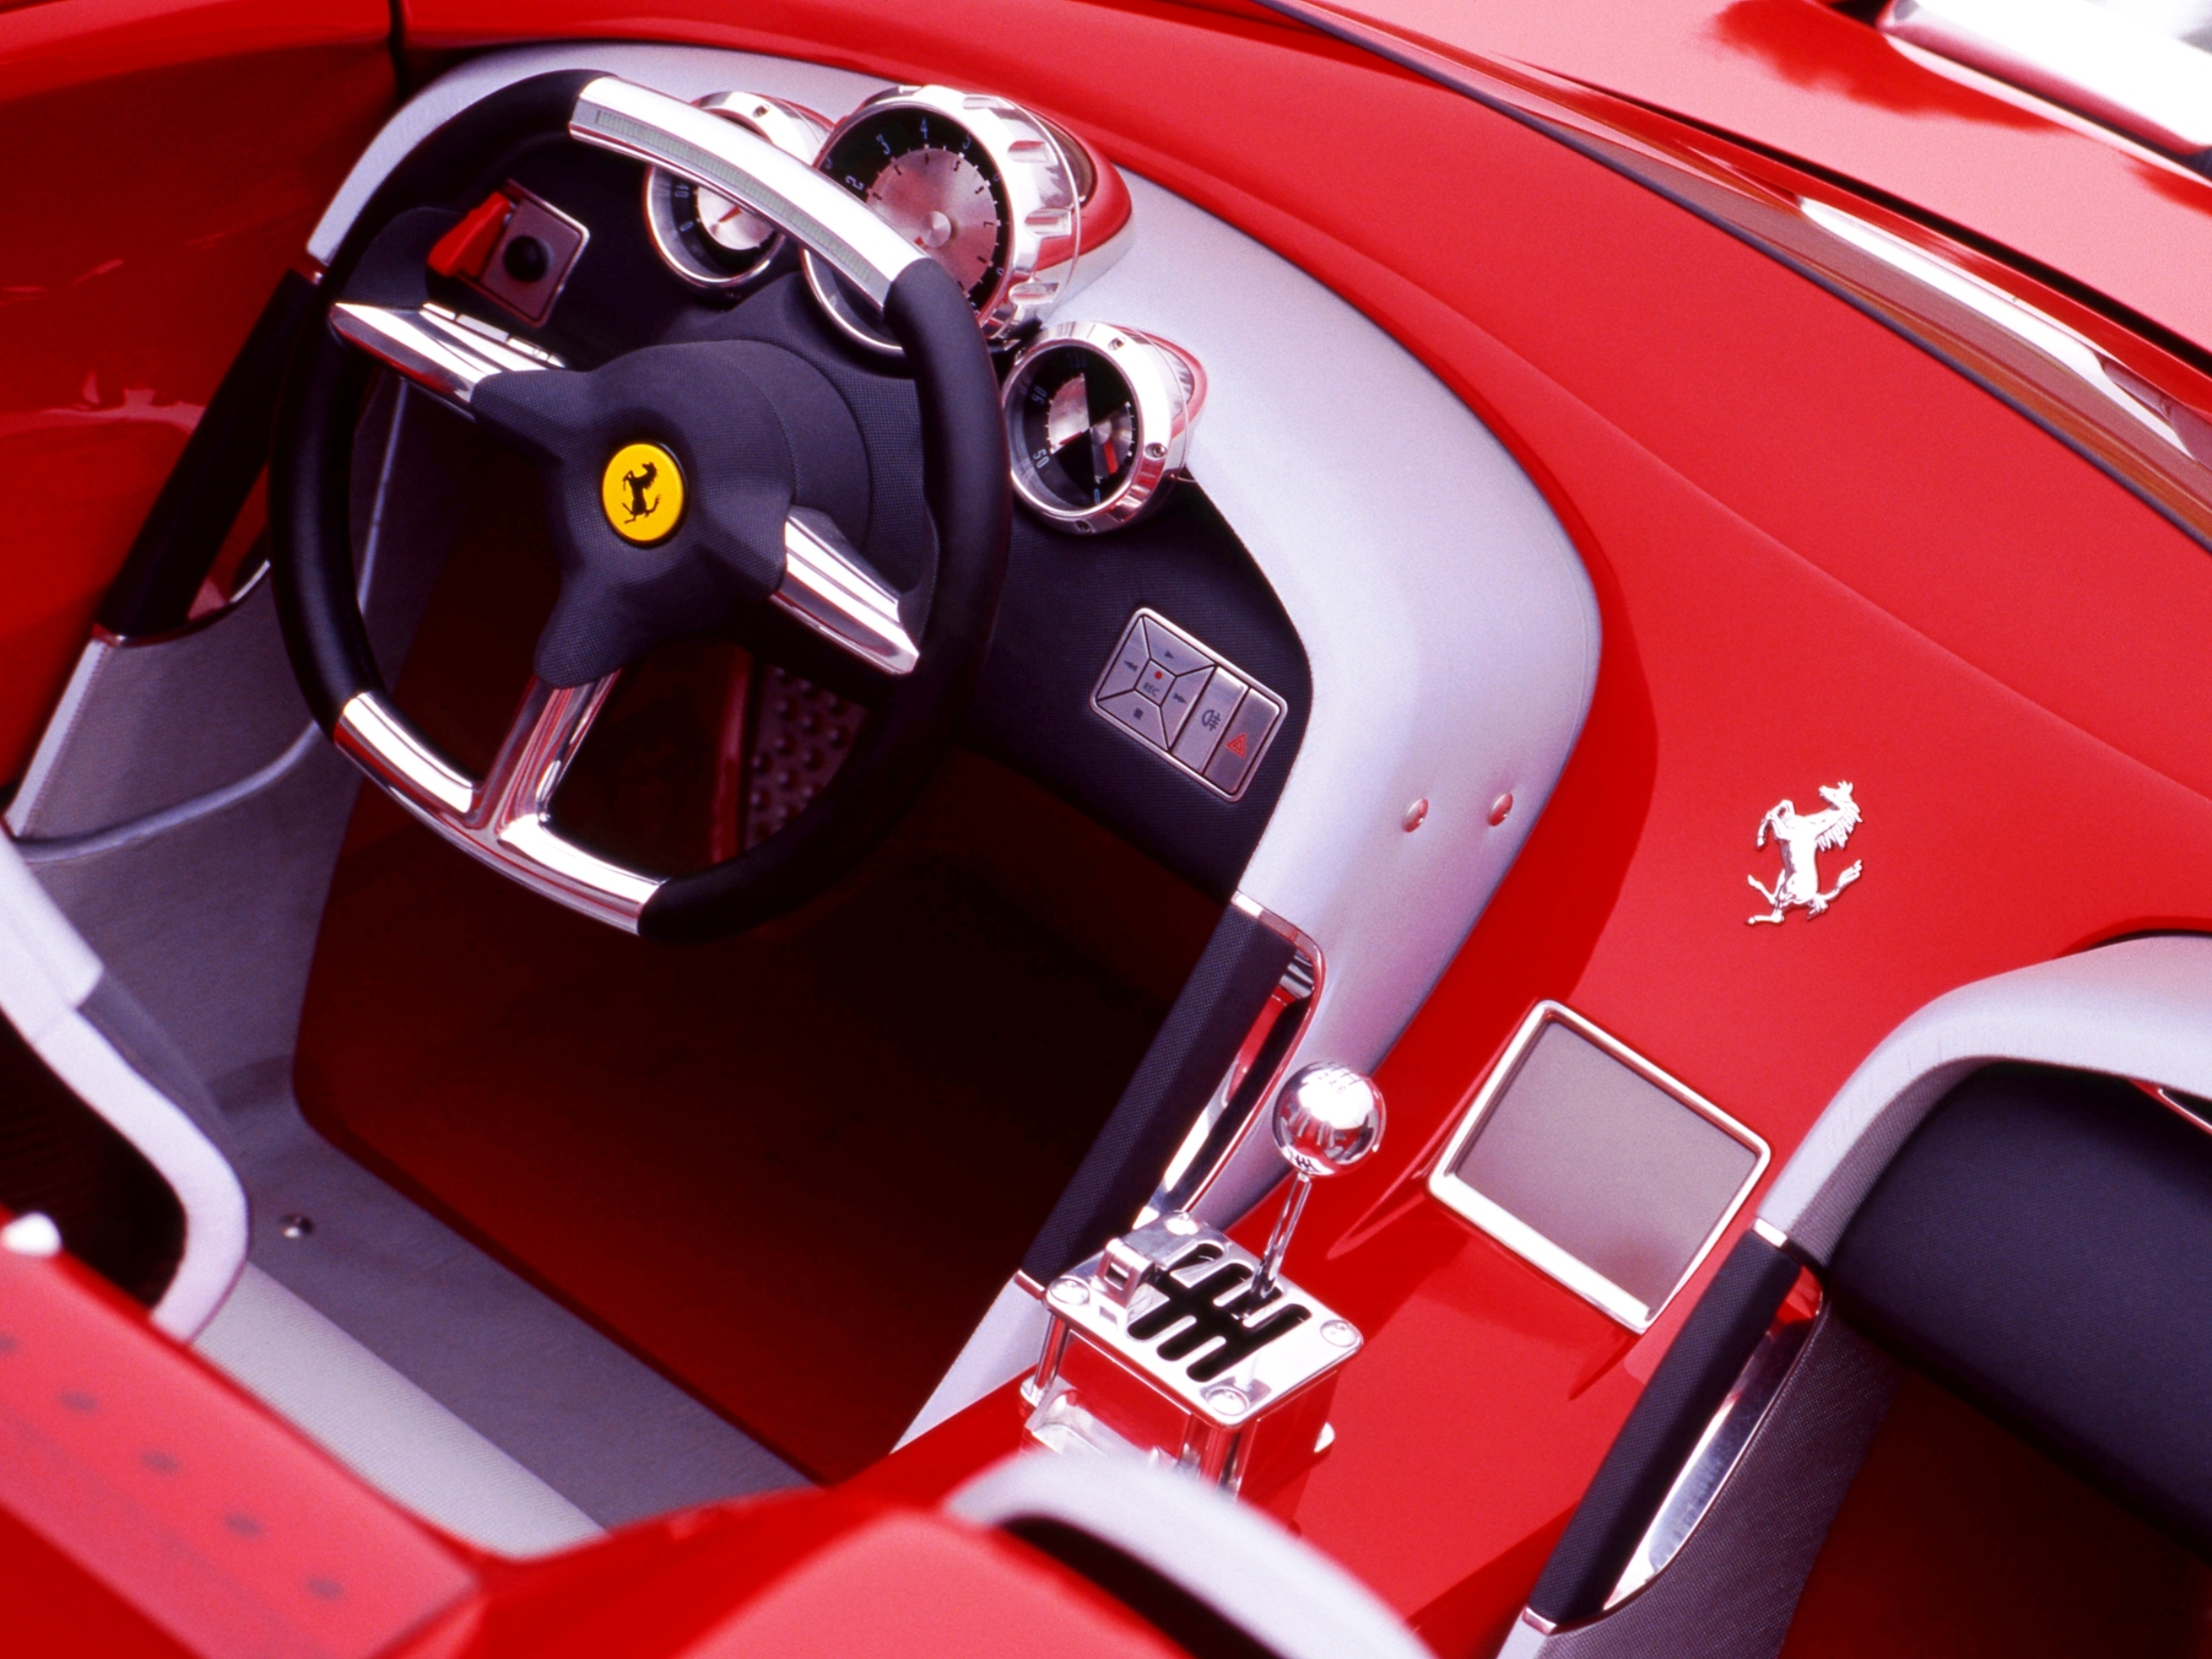 Concept Flashback 2000 Ferrari Rossa Concept Speedster